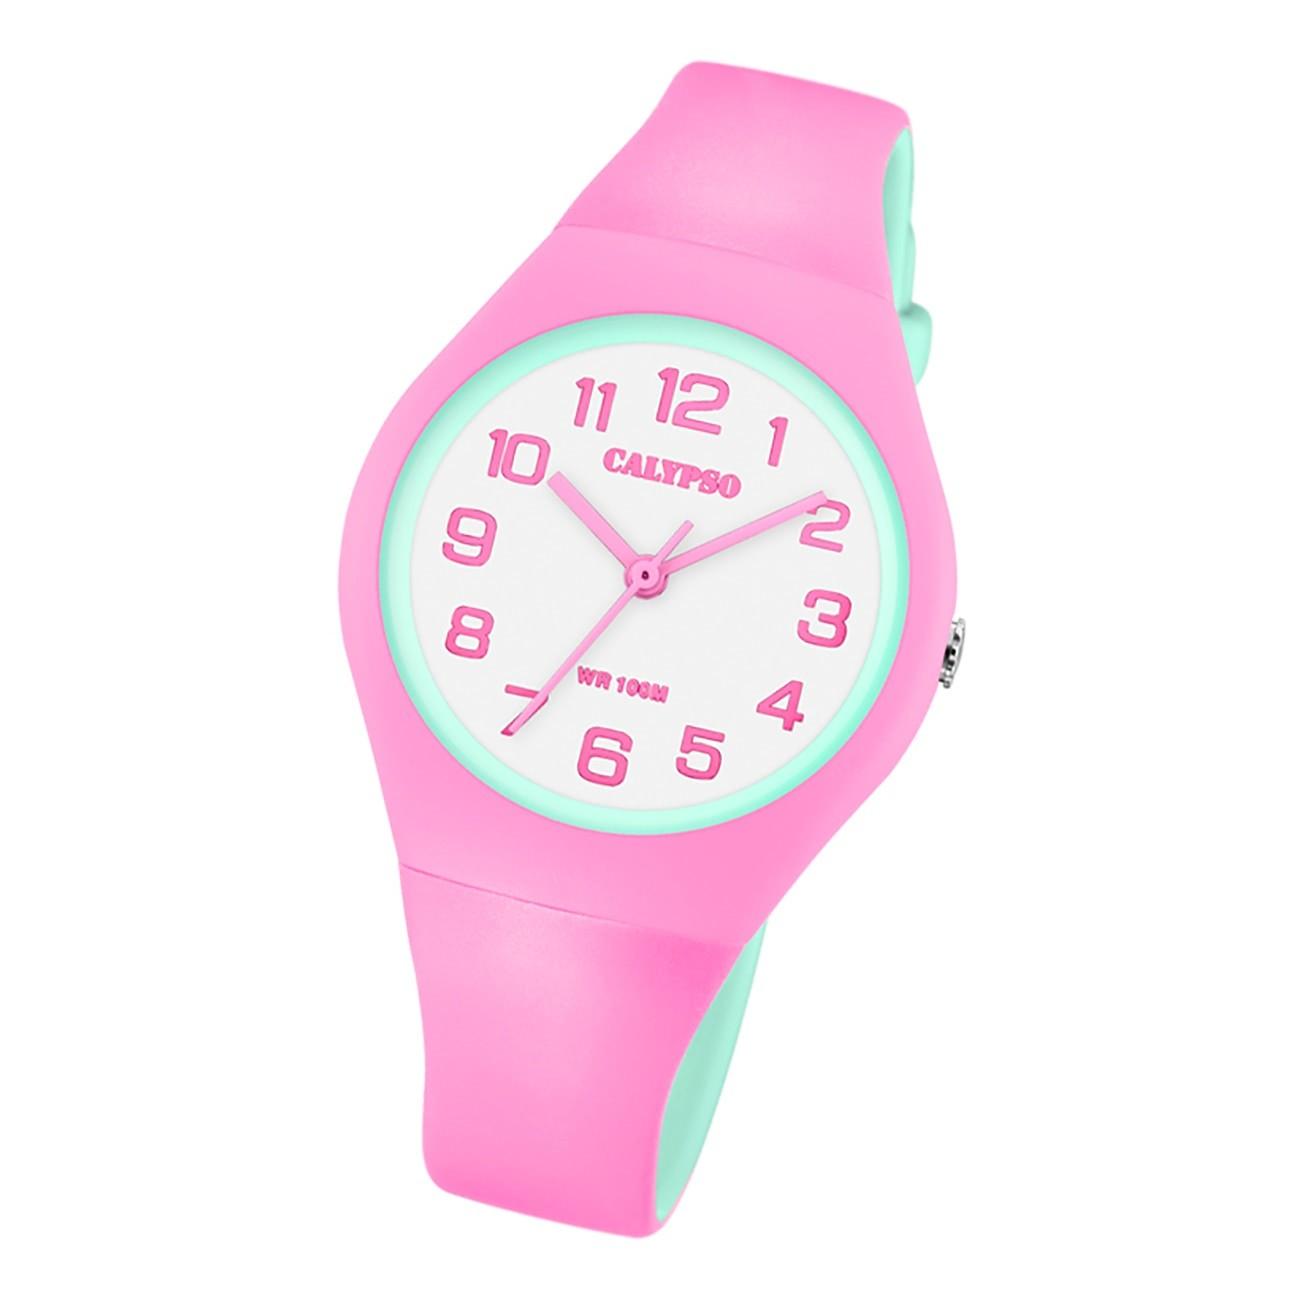 Calypso Damen Jugend Armbanduhr Fashion K5777/6 Analog Kunststoff pink UK5777/6